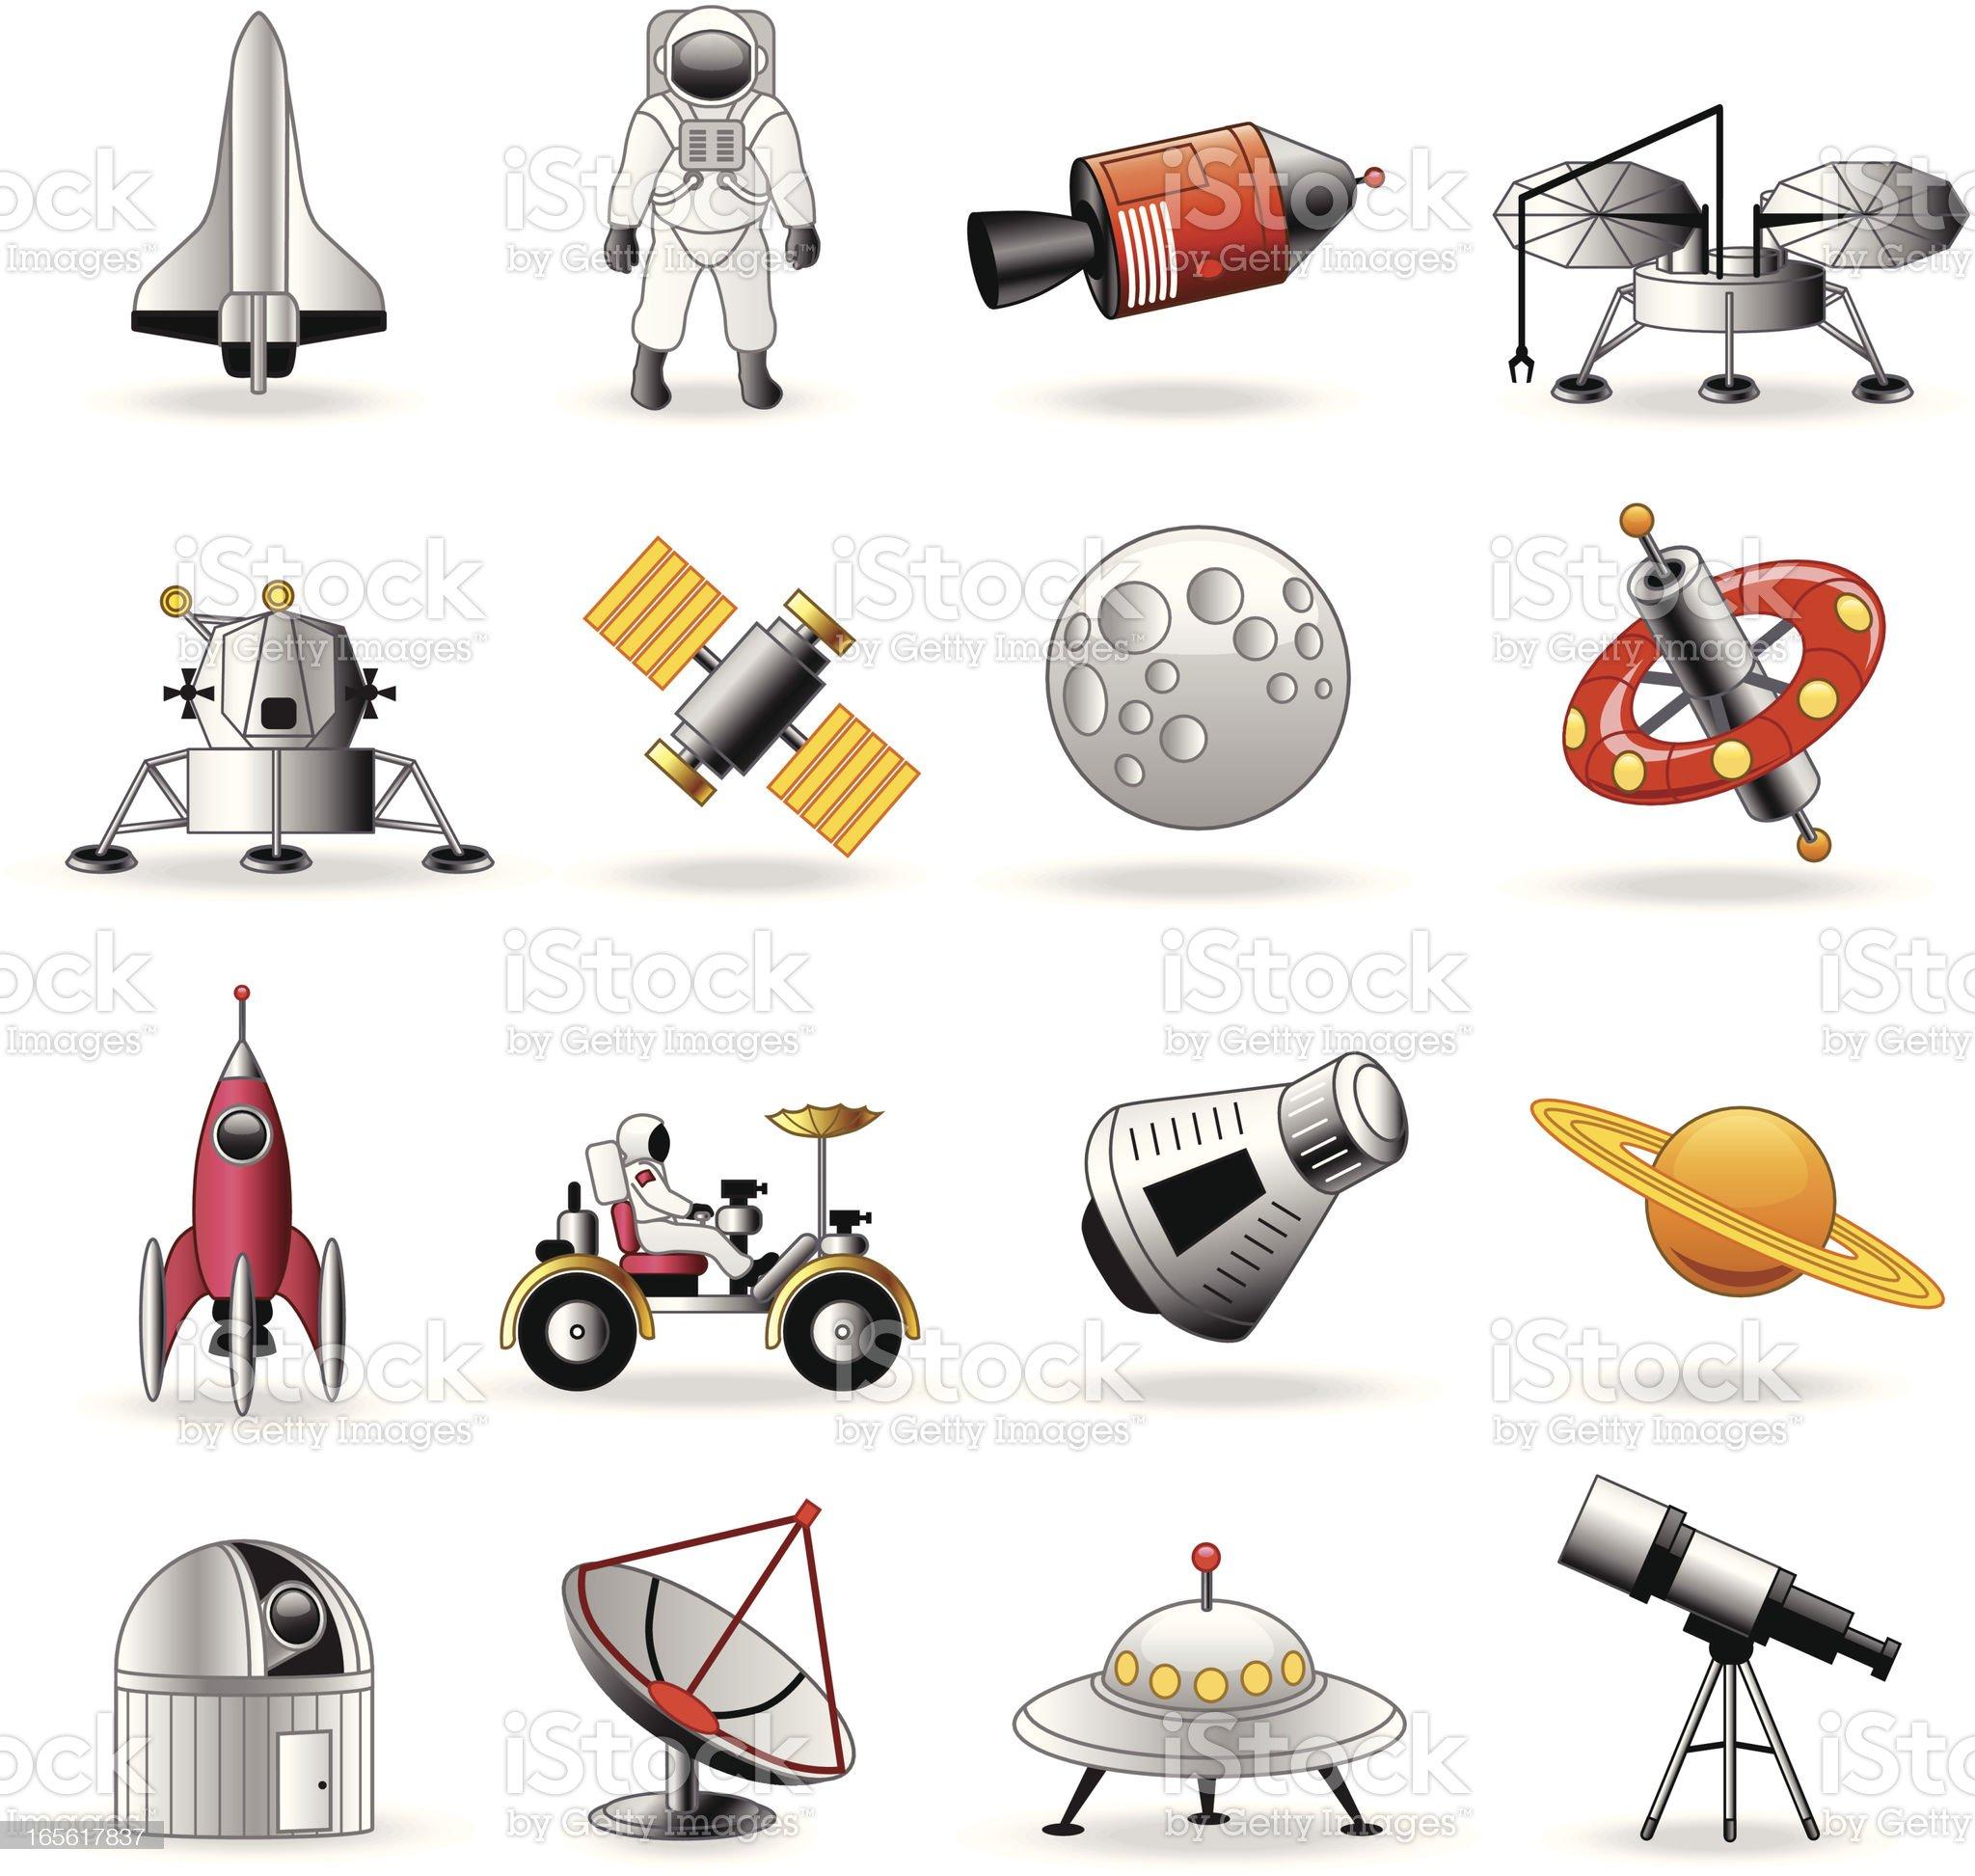 Space exploration icons cartoon royalty-free stock vector art